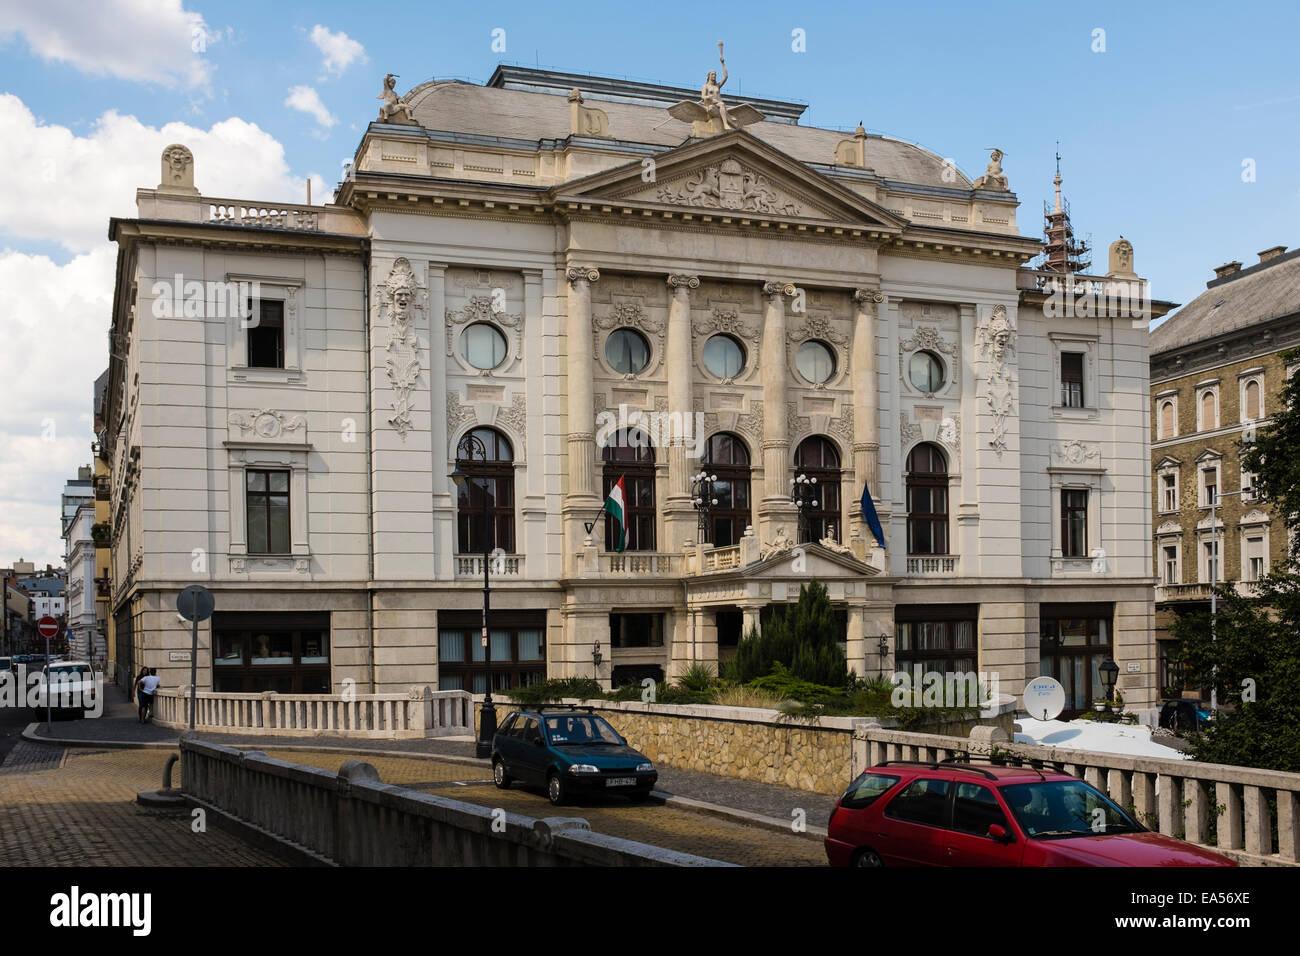 Exterior view of Heritage House / Hagyomanyok Haza, in the Visivaros district of Budapest, Hungary. - Stock Image